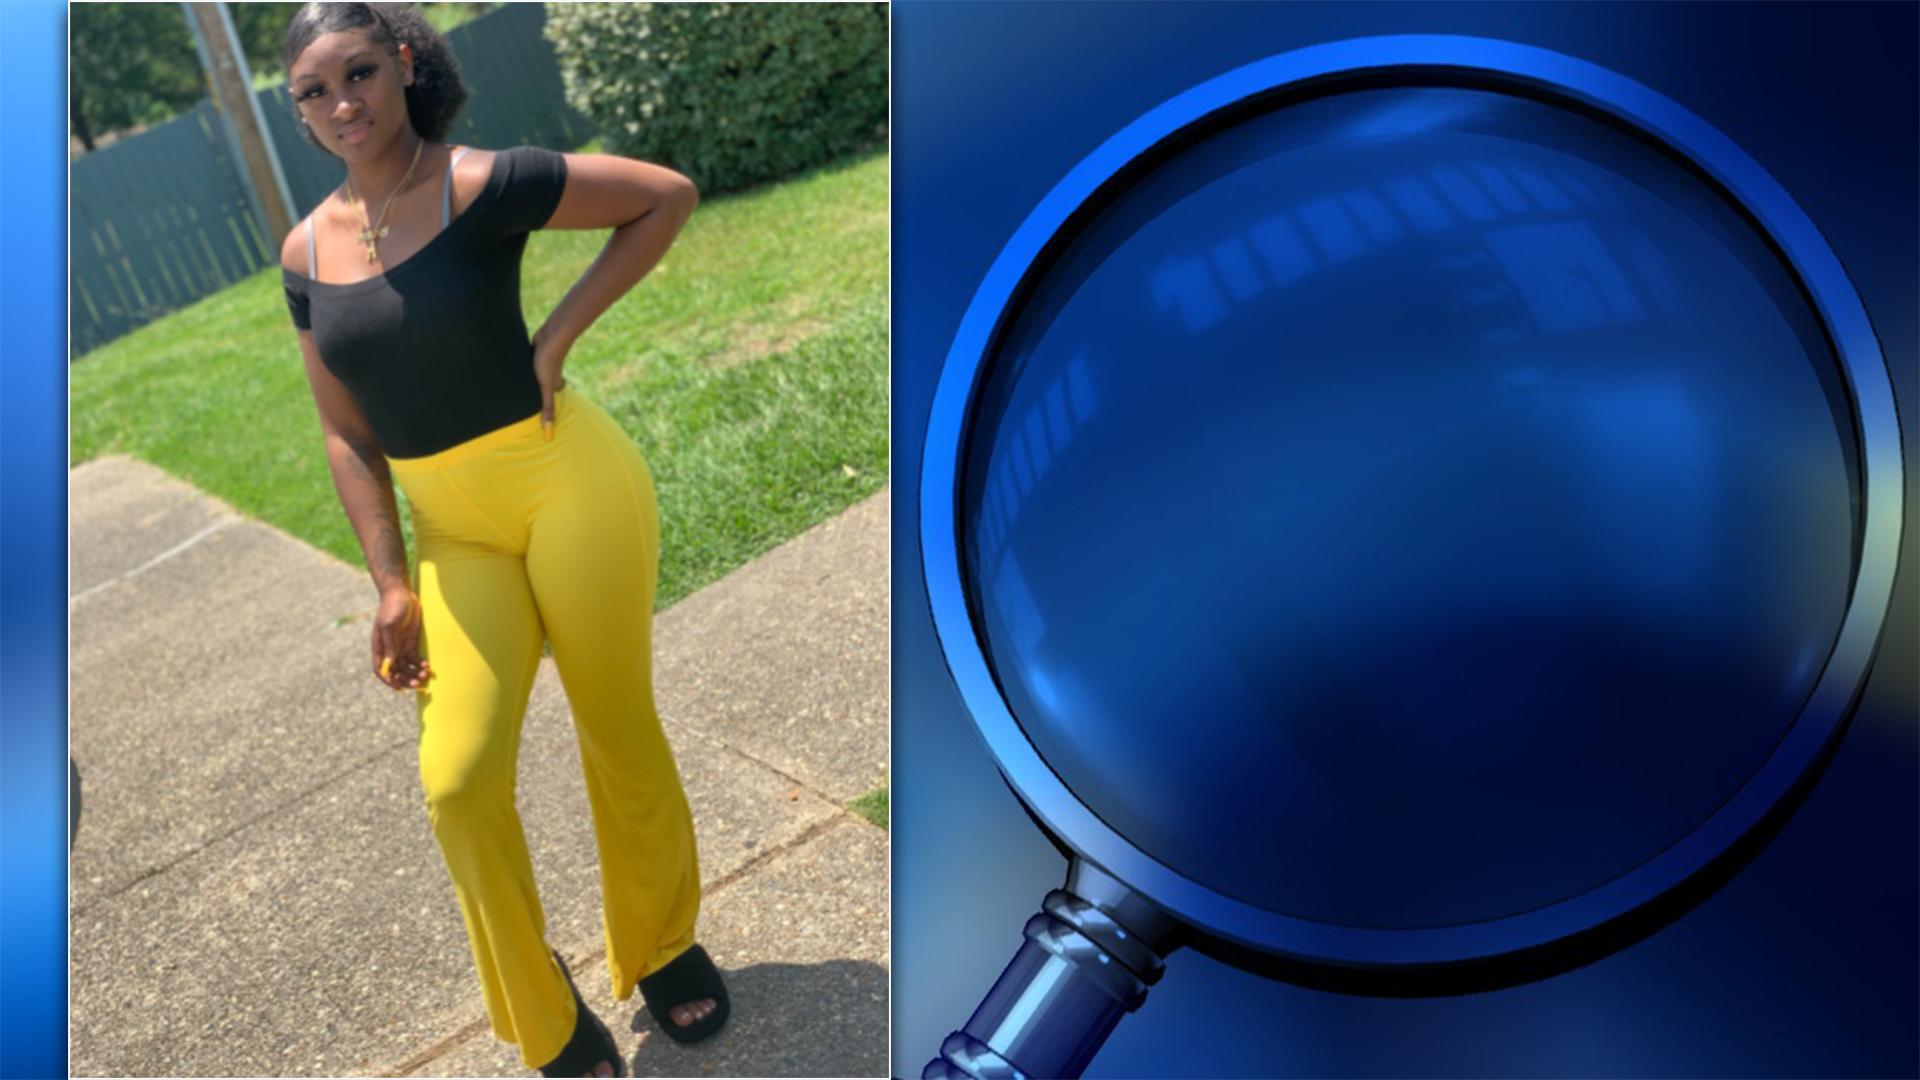 Spd 15 Year Old Runaway Girl Has Been Found Arklatexhomepage